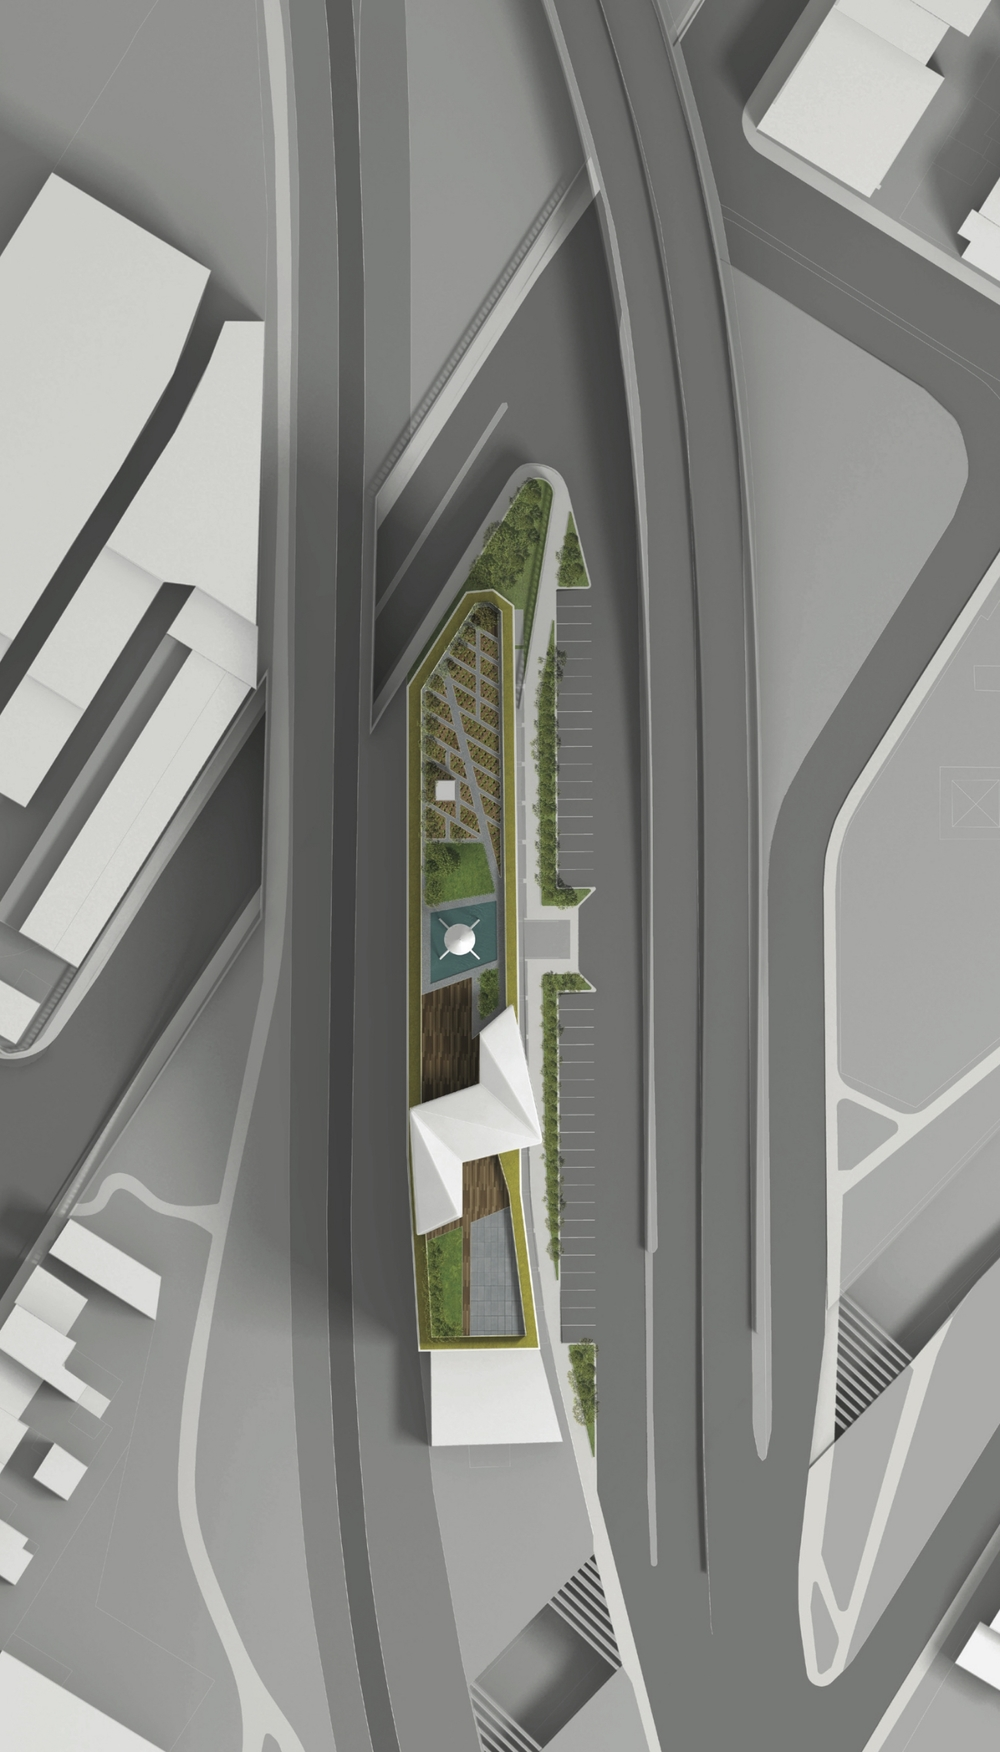 1 Van Horne Architectural Rendering